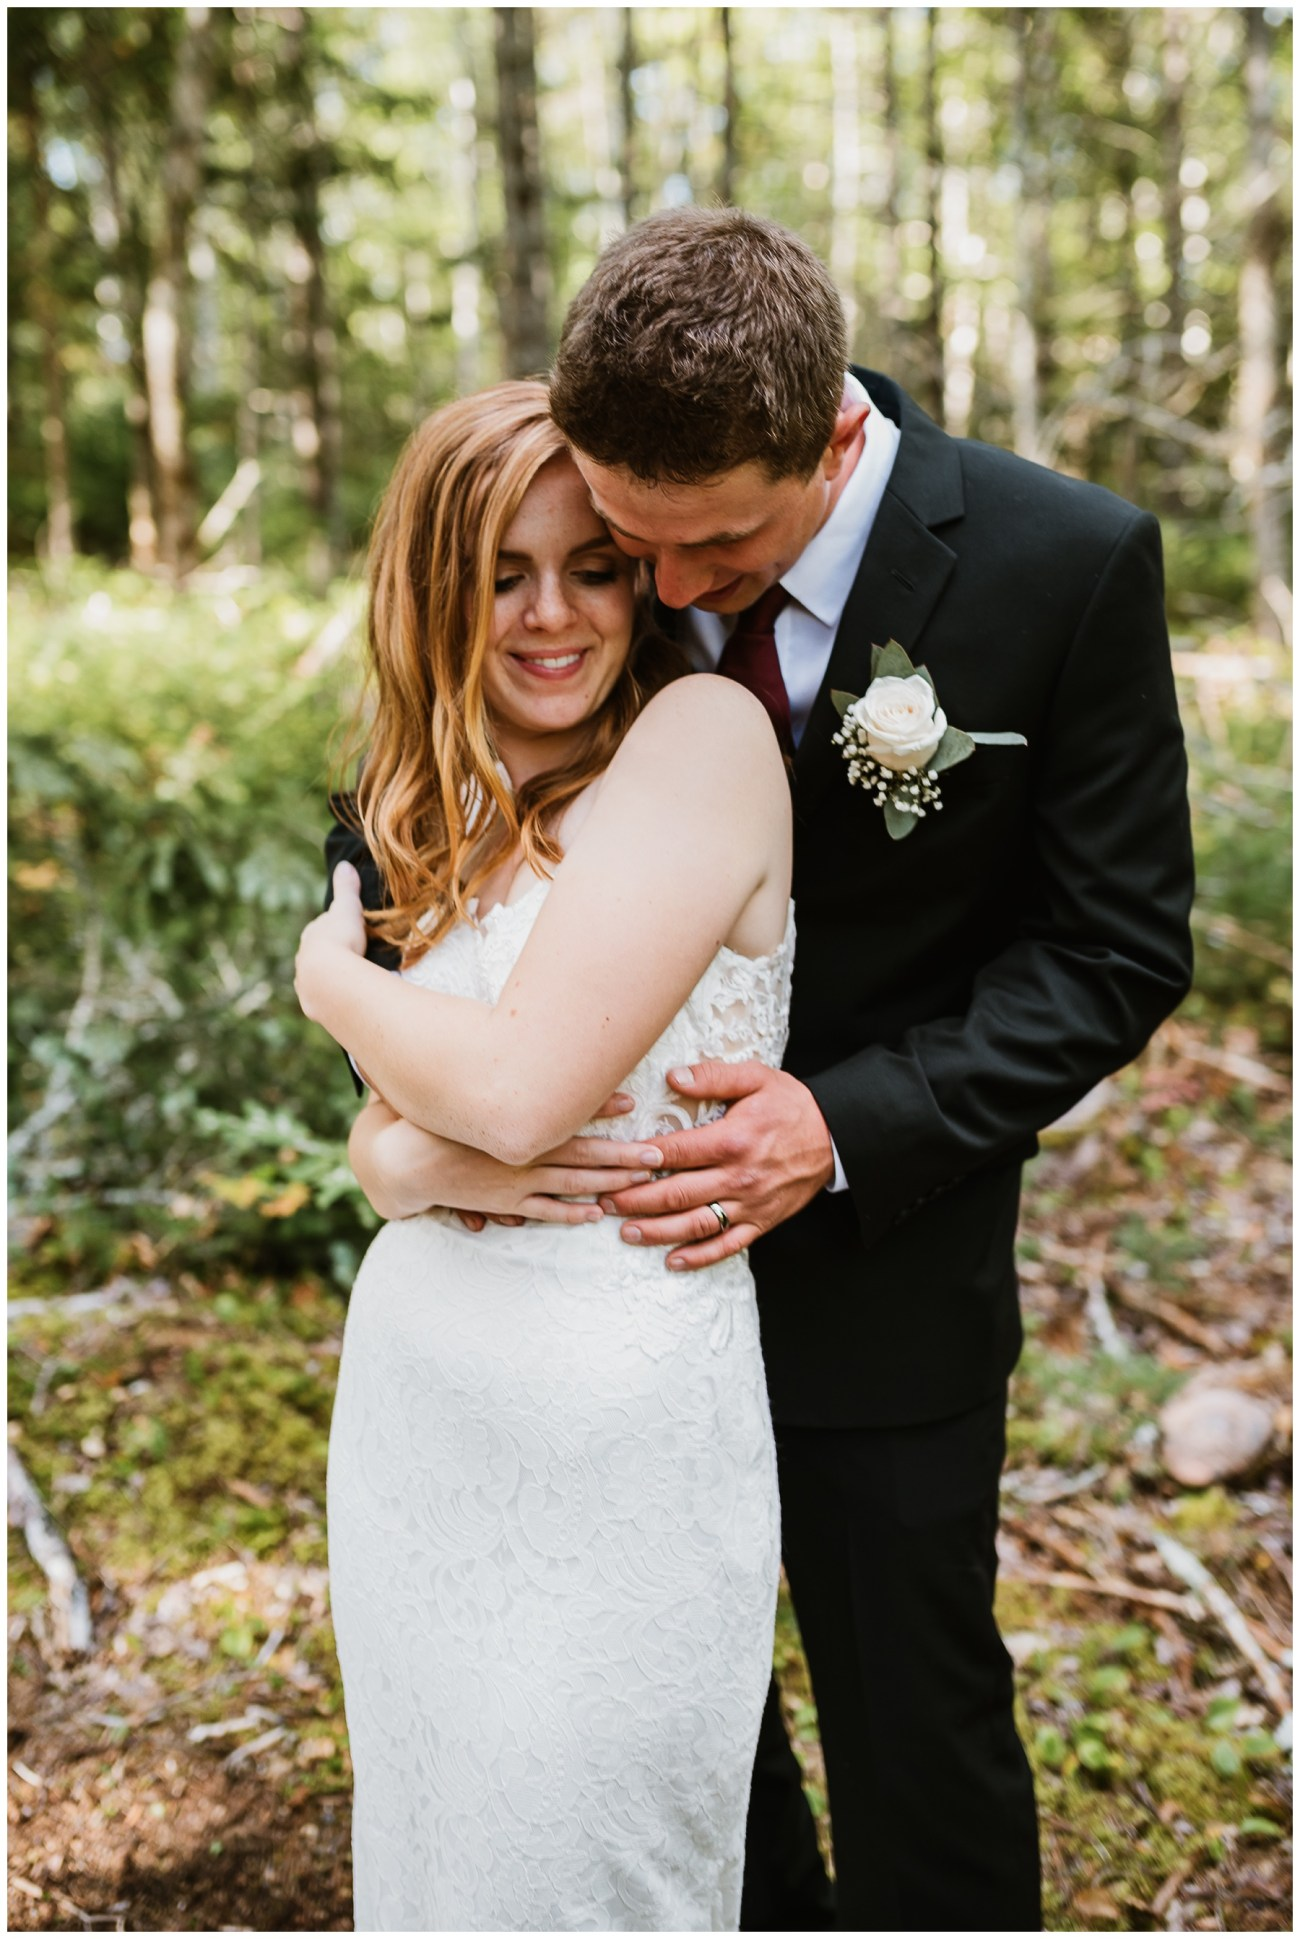 intimate-backyard-wedding-chester-nova-scotia_67.jpg